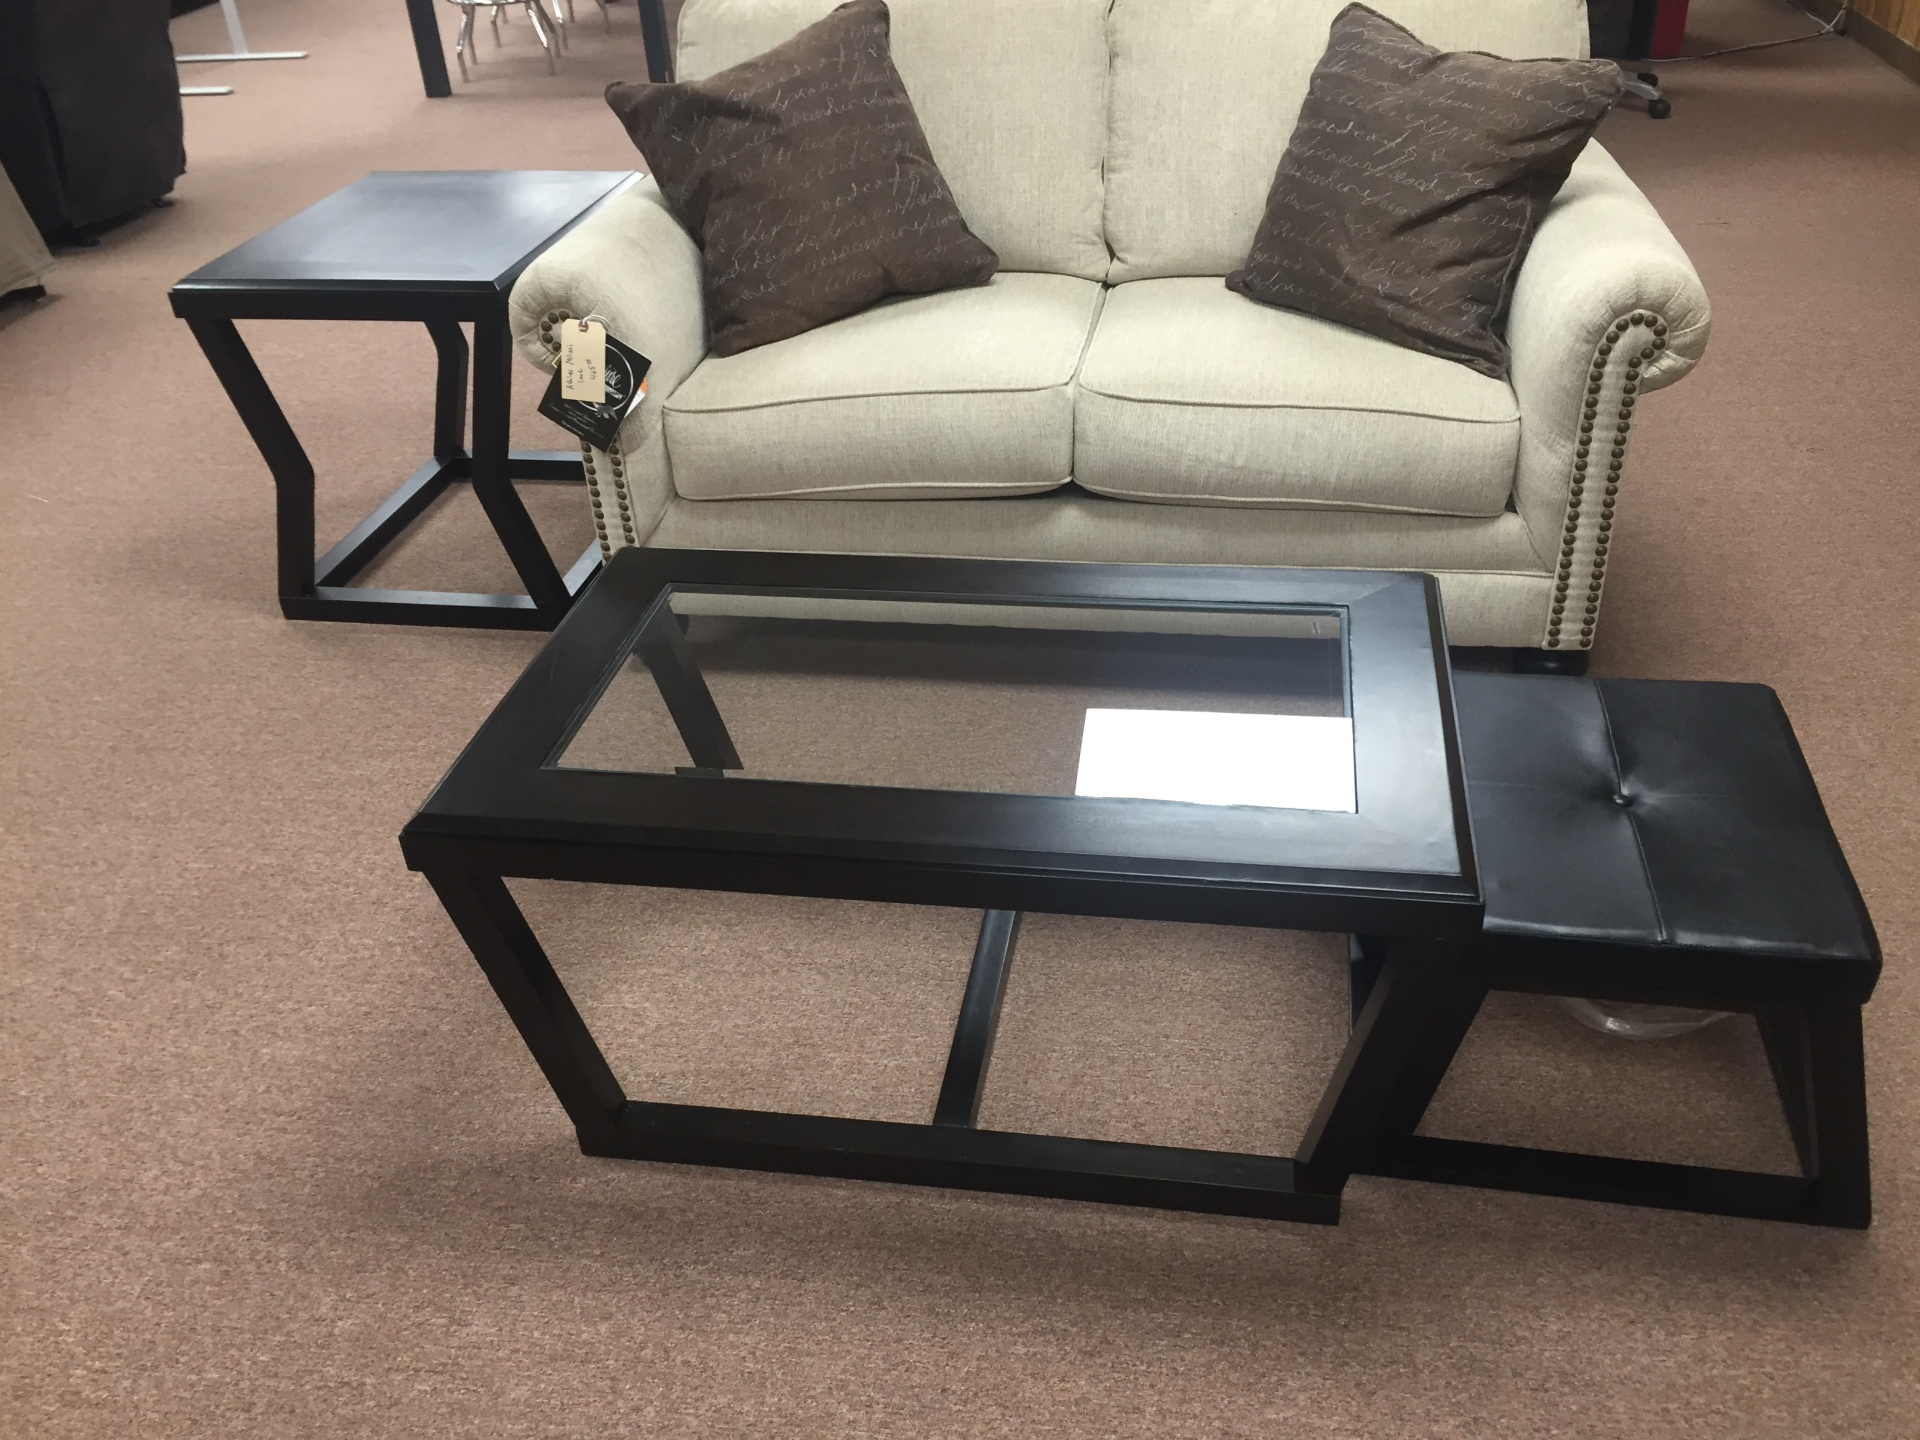 Ashley table/2 stools